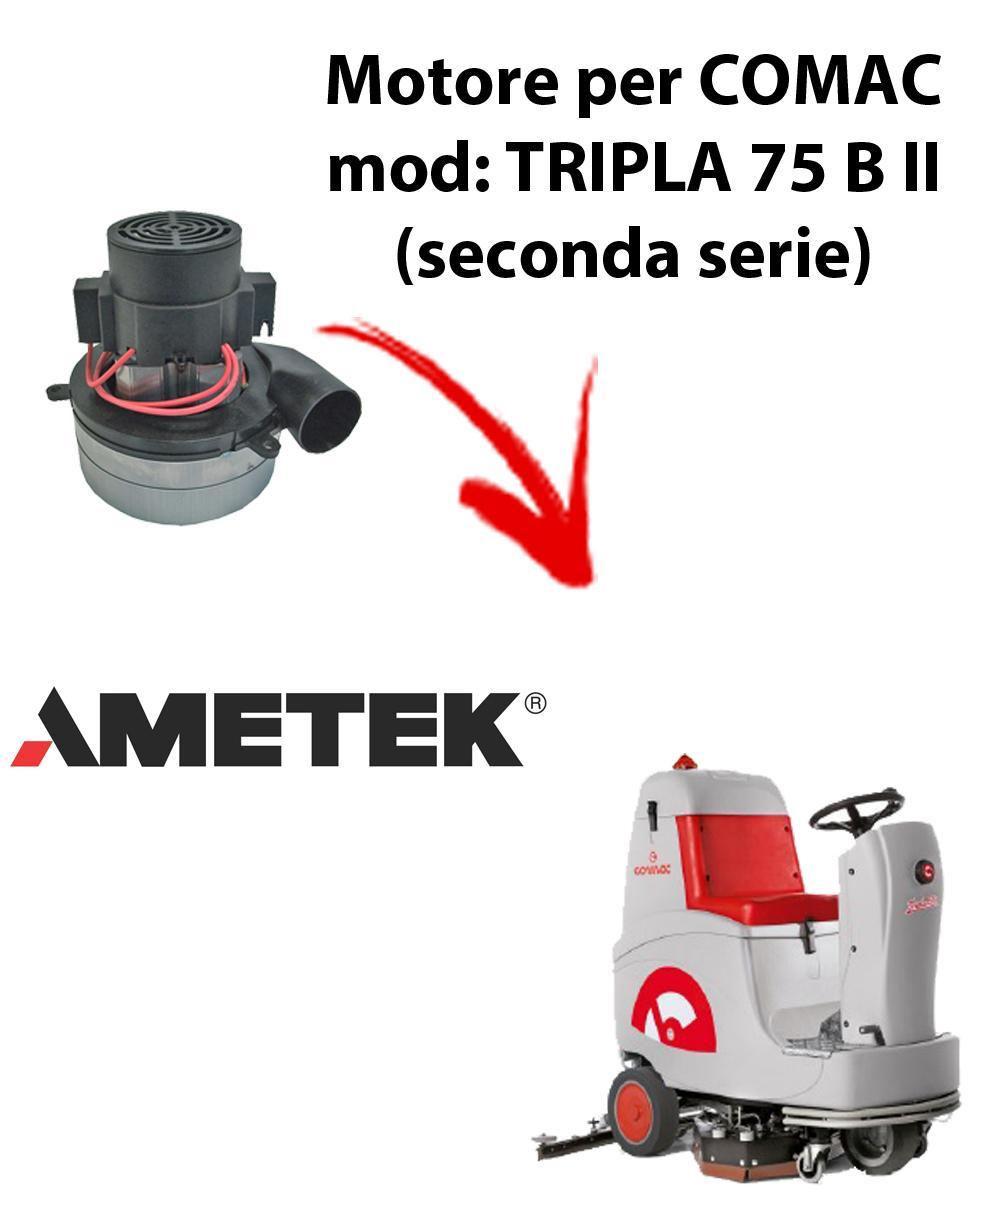 TRIPLA 75B II Saugmotor AMETEK ITALIA für scheuersaugmaschinen Comac